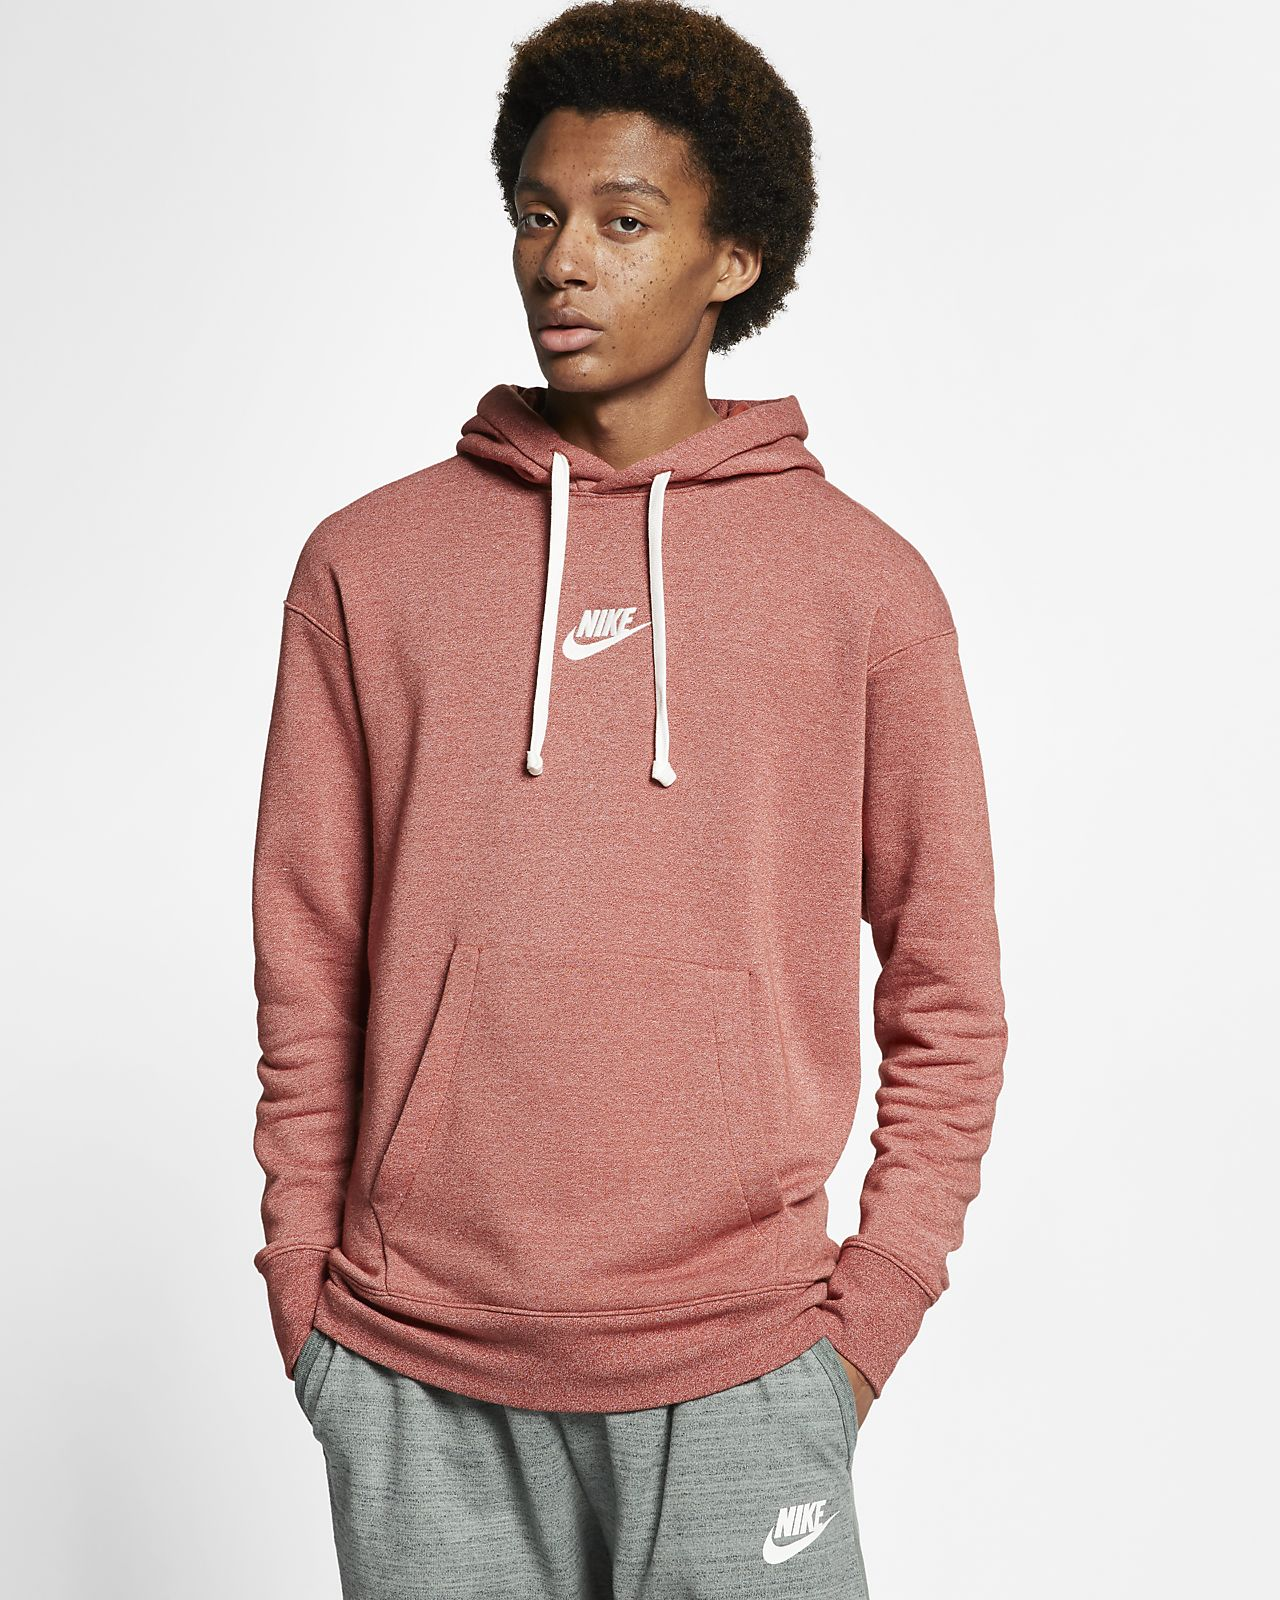 7f5d4d110 Nike Sportswear Heritage Men's Pullover Hoodie. Nike.com